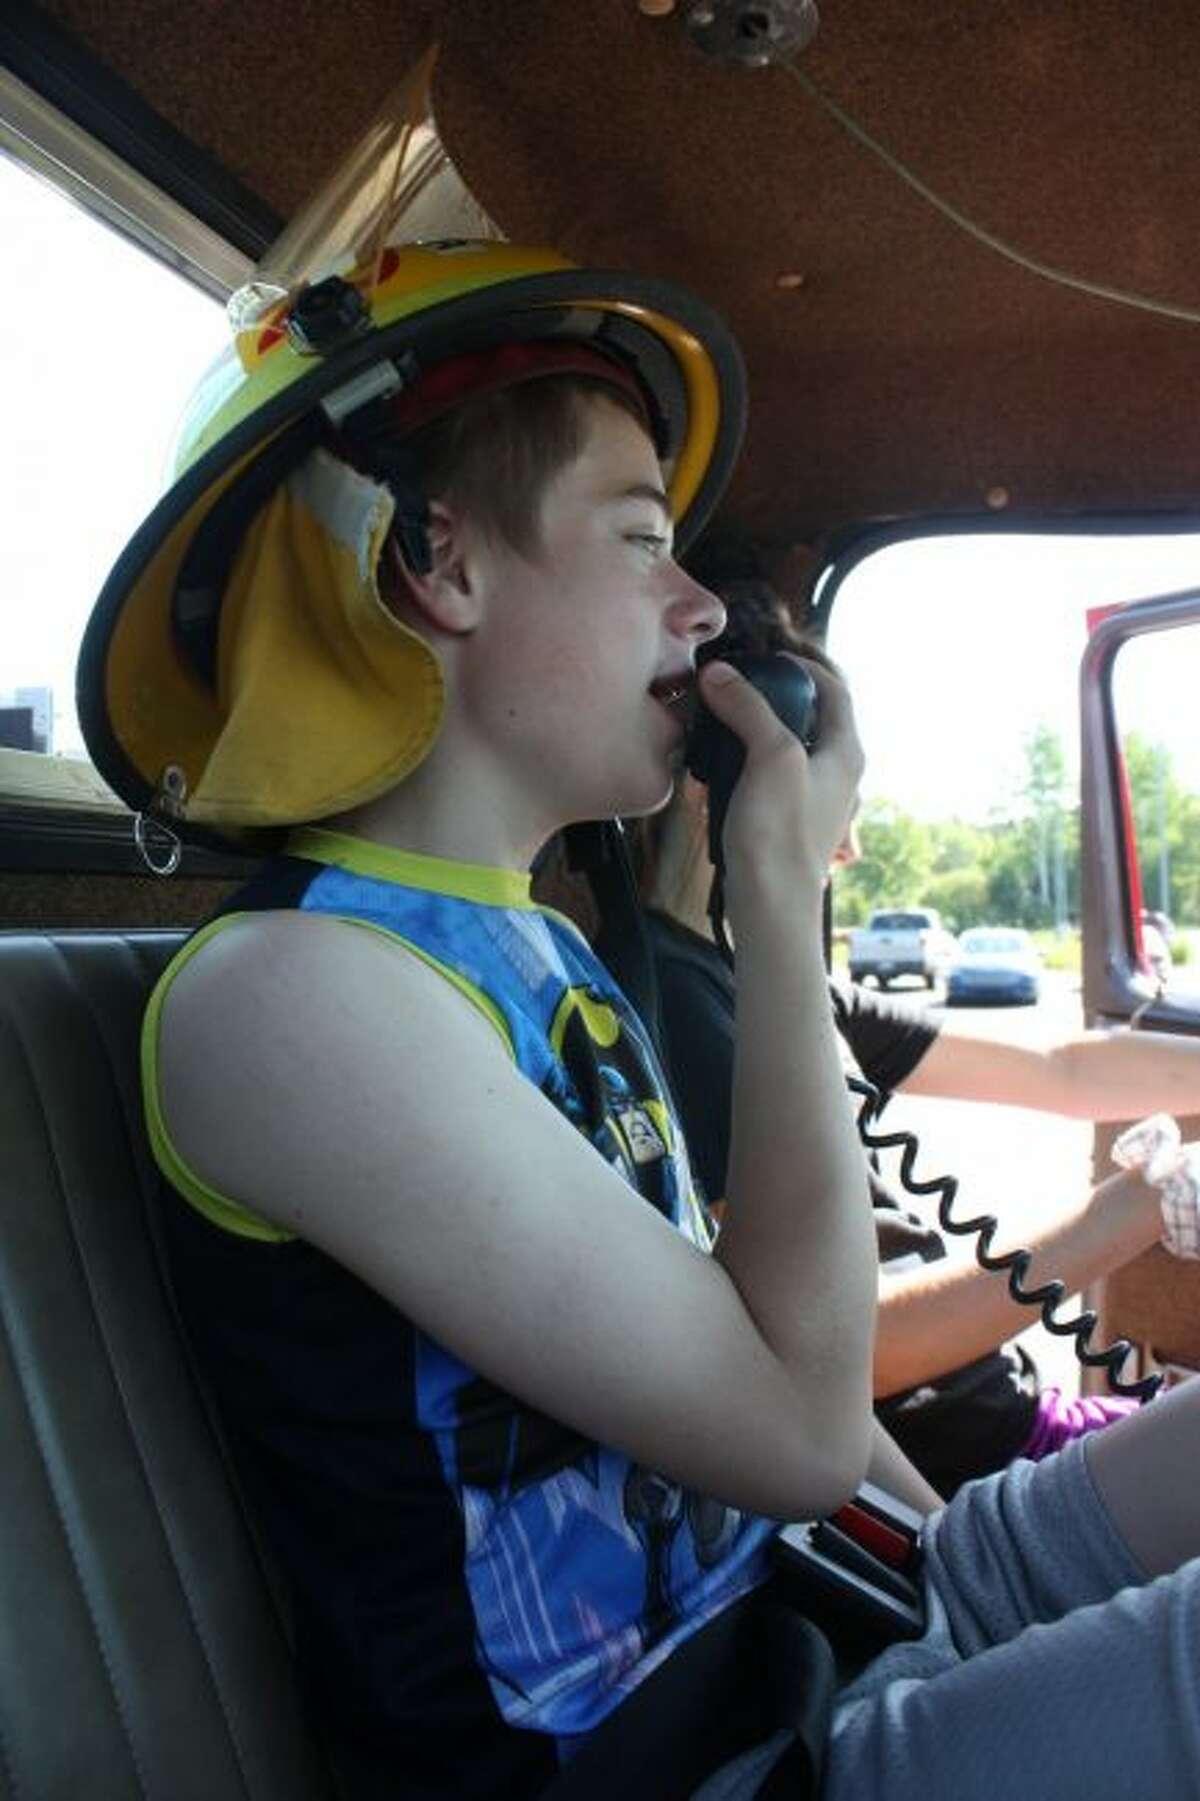 Mecosta-Osceola Intermediate School District Education Center student Devin Wright speaks into a walkie-talkie on a fire truck Friday. (Pioneer photo/Tim Rath)